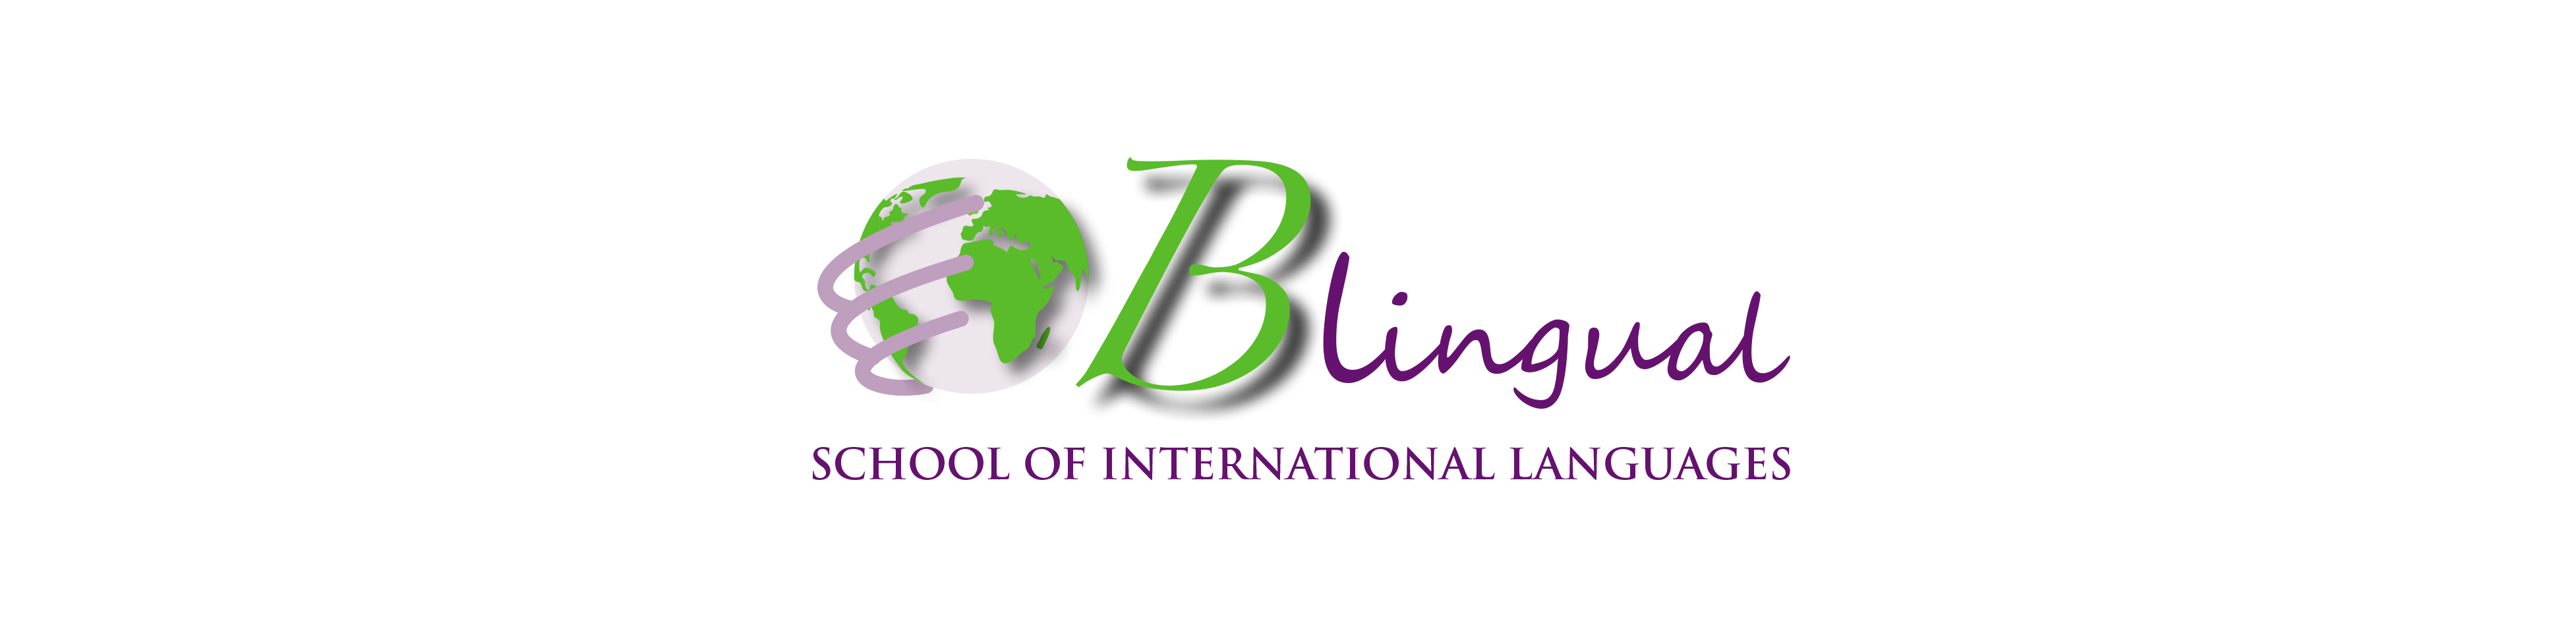 B-Lingual School